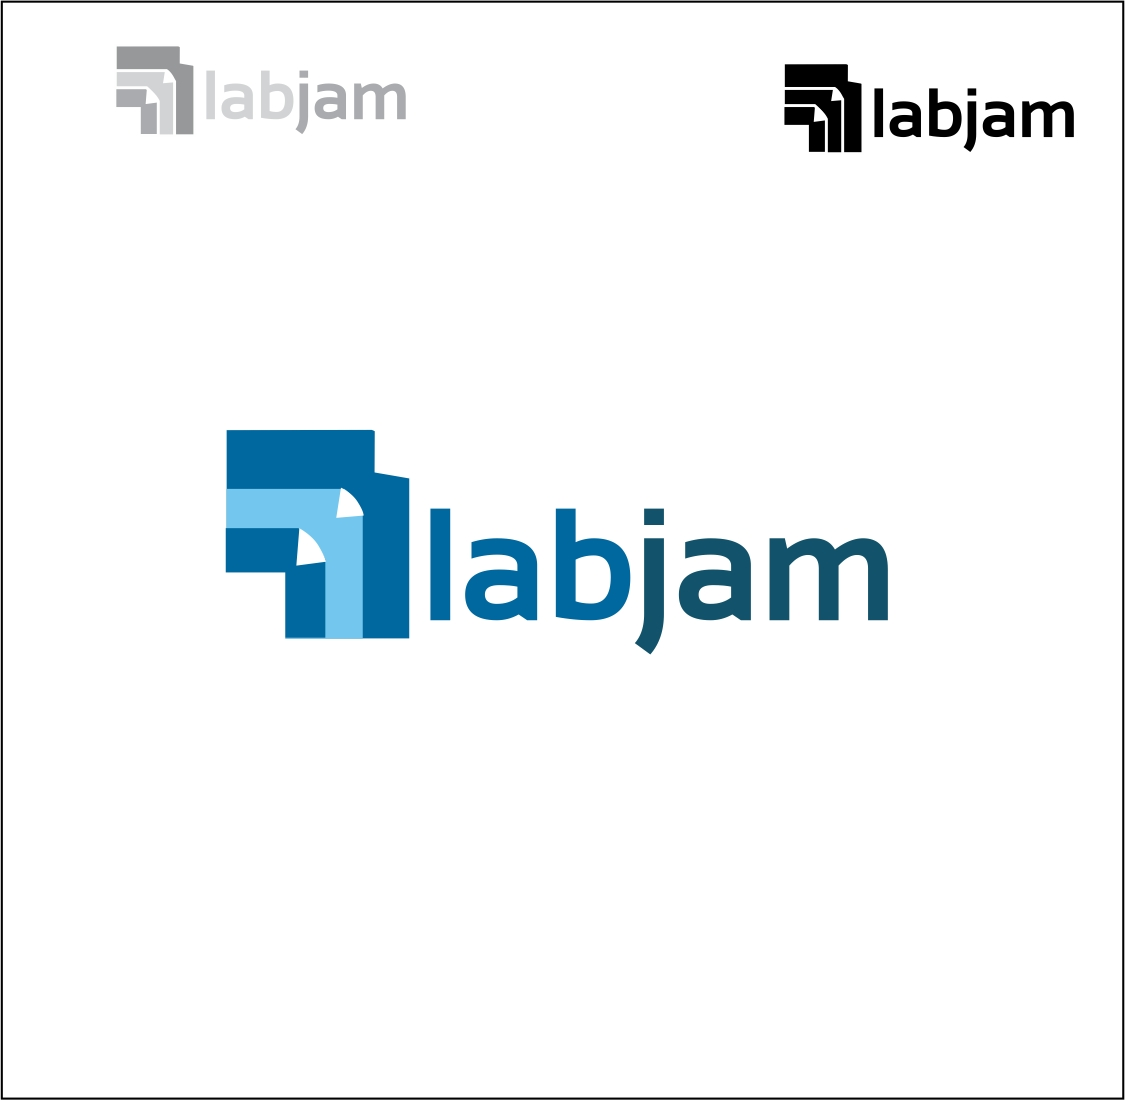 Logo Design by arkvisdesigns - Entry No. 116 in the Logo Design Contest Labjam.